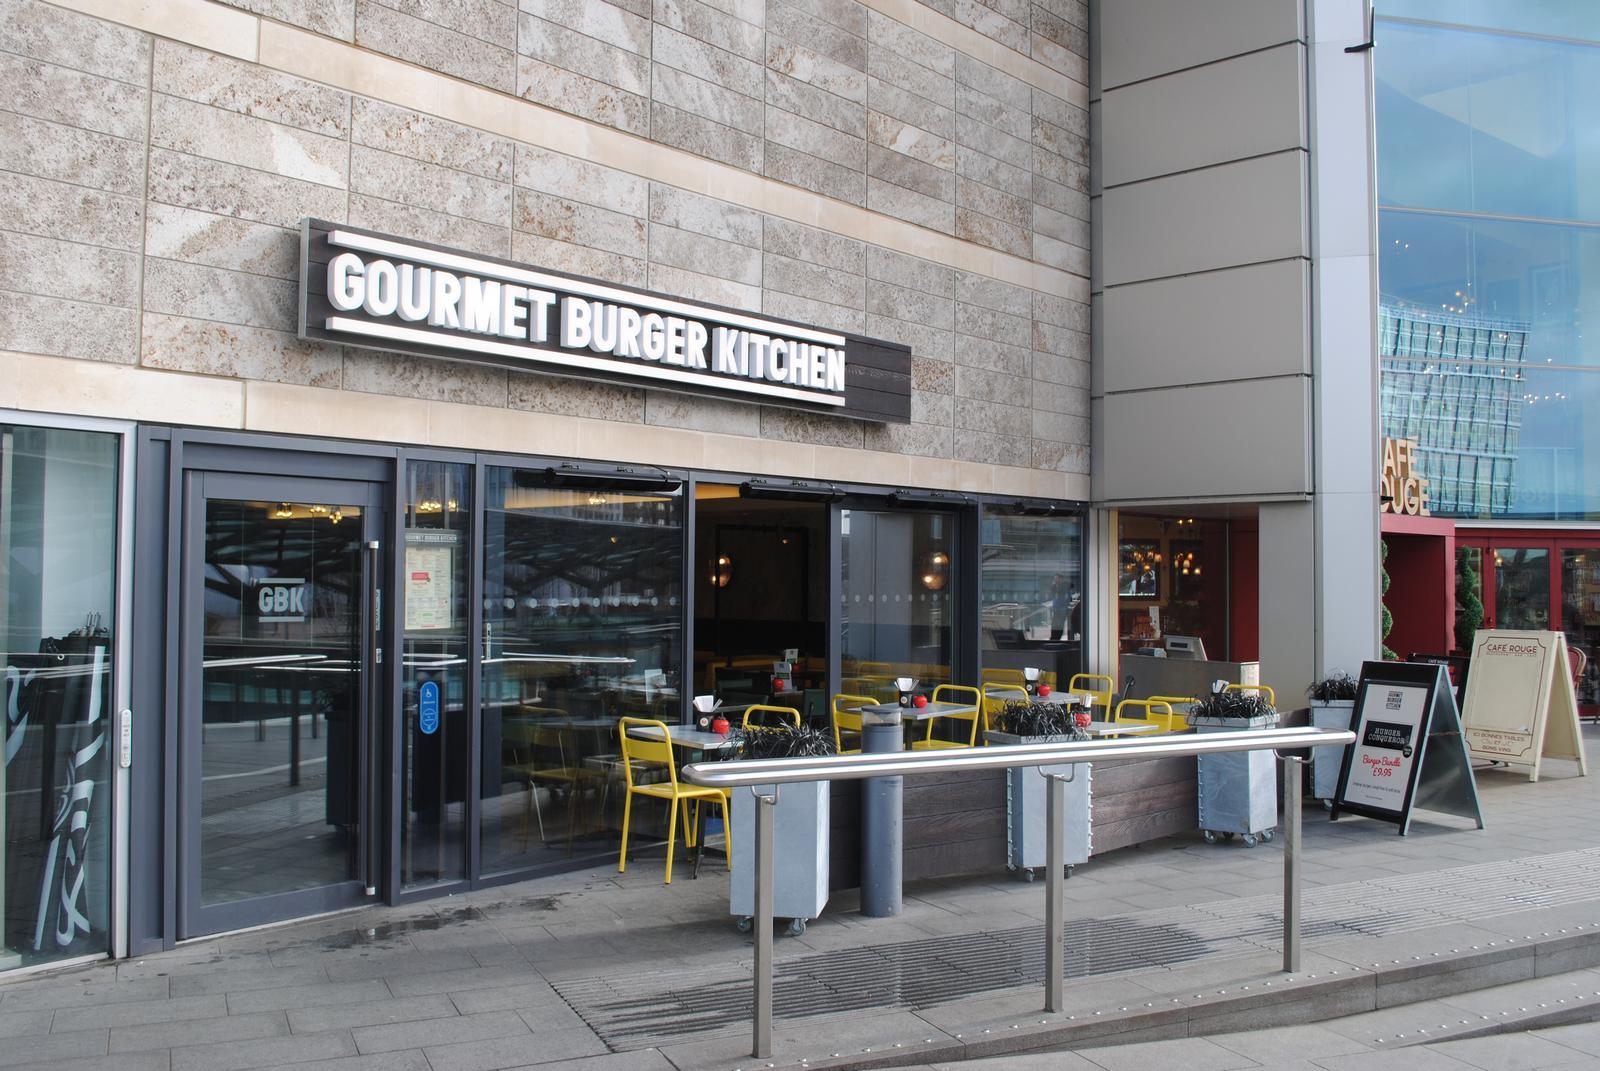 Gourmet Burger Kitchen Liverpool 8 Stuart Consultancy Ltd